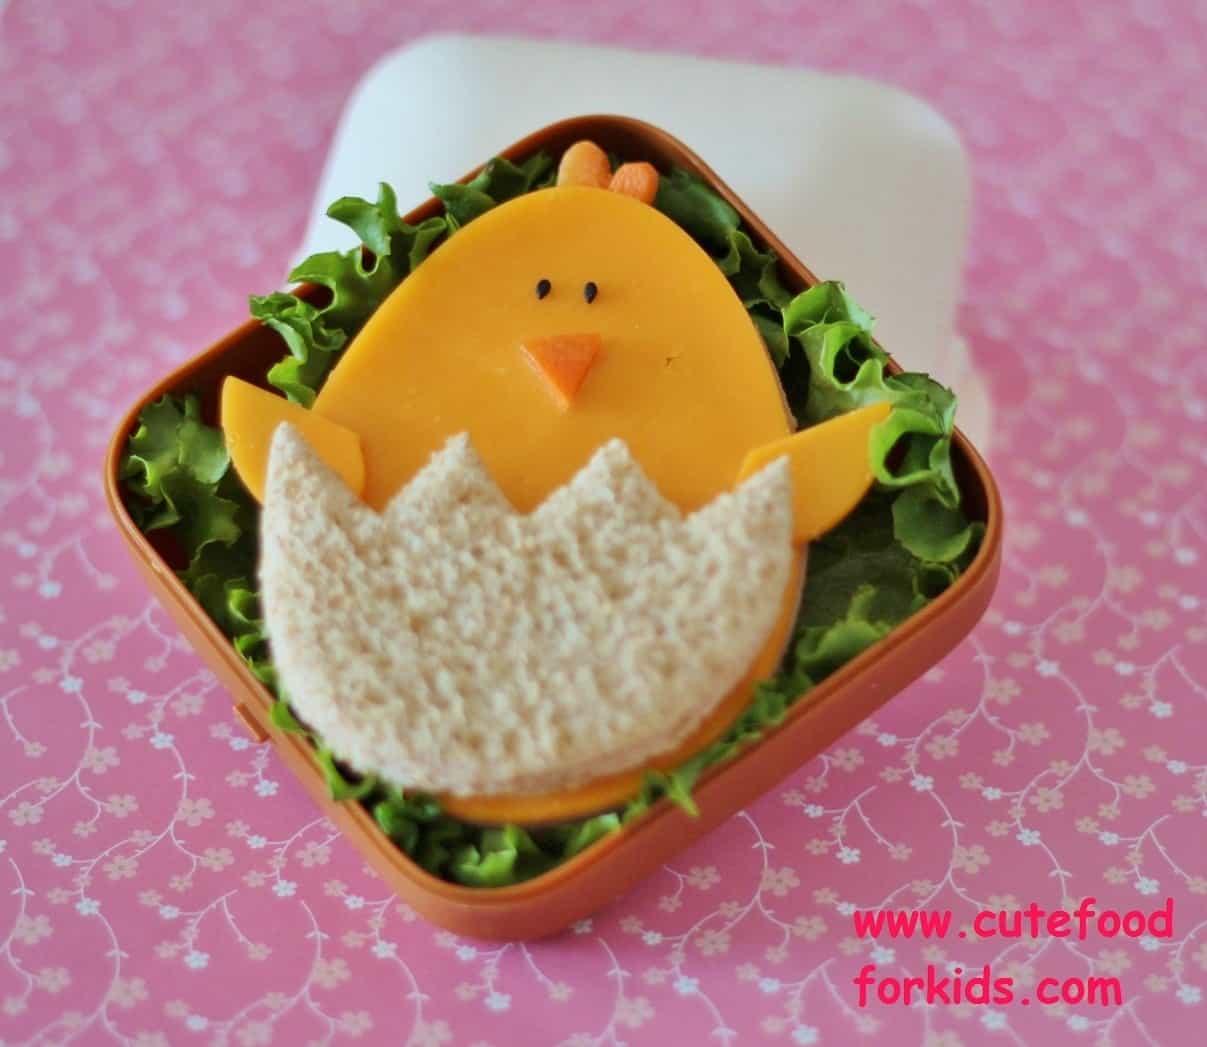 Baby chick sandwich